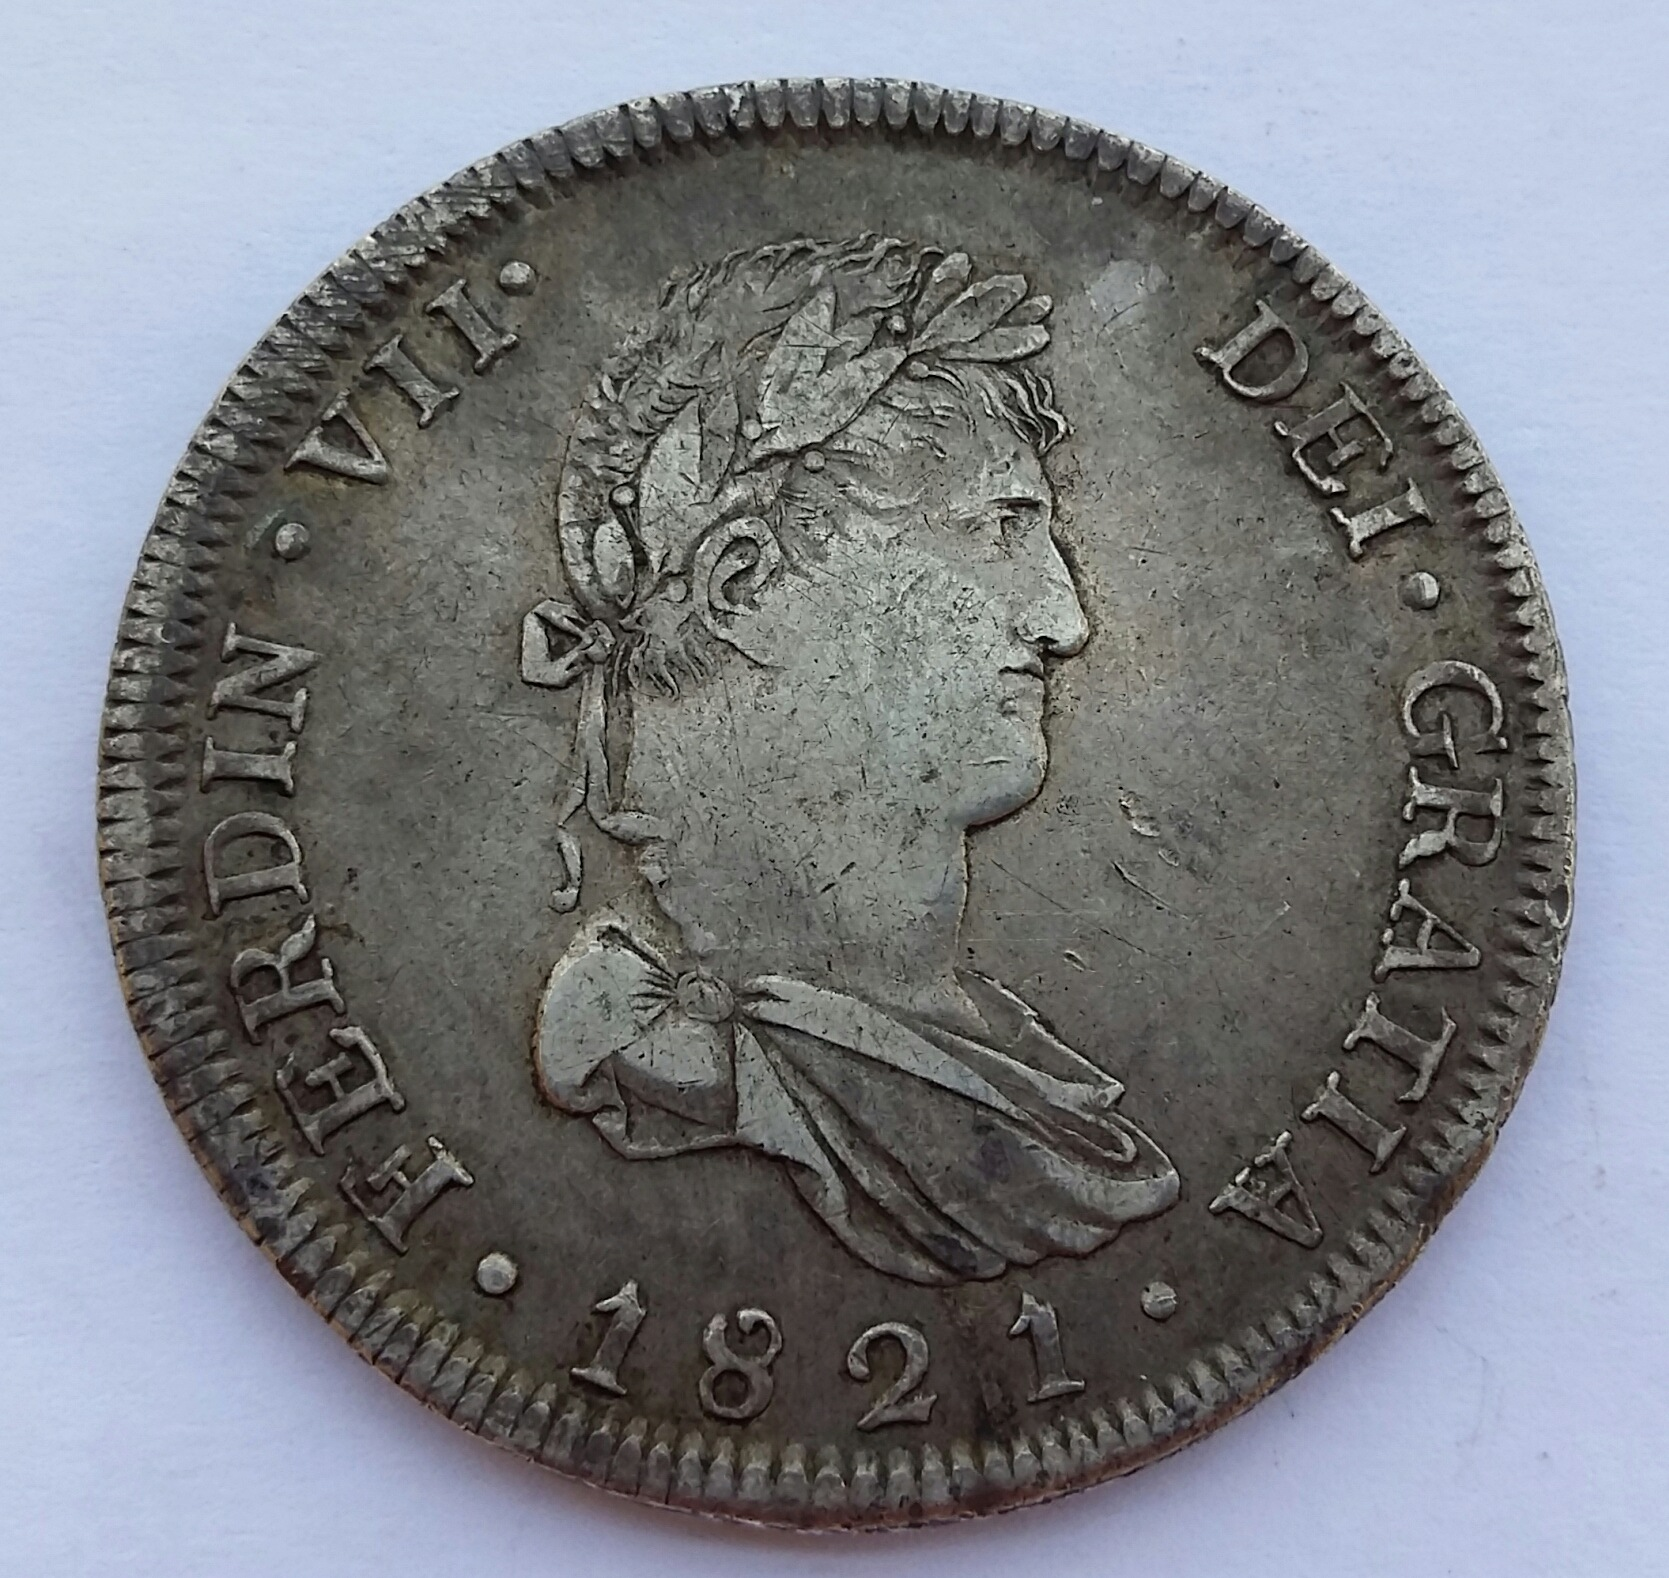 8 Reales 1821. Fernando VII. Guadalajara FS  20200511